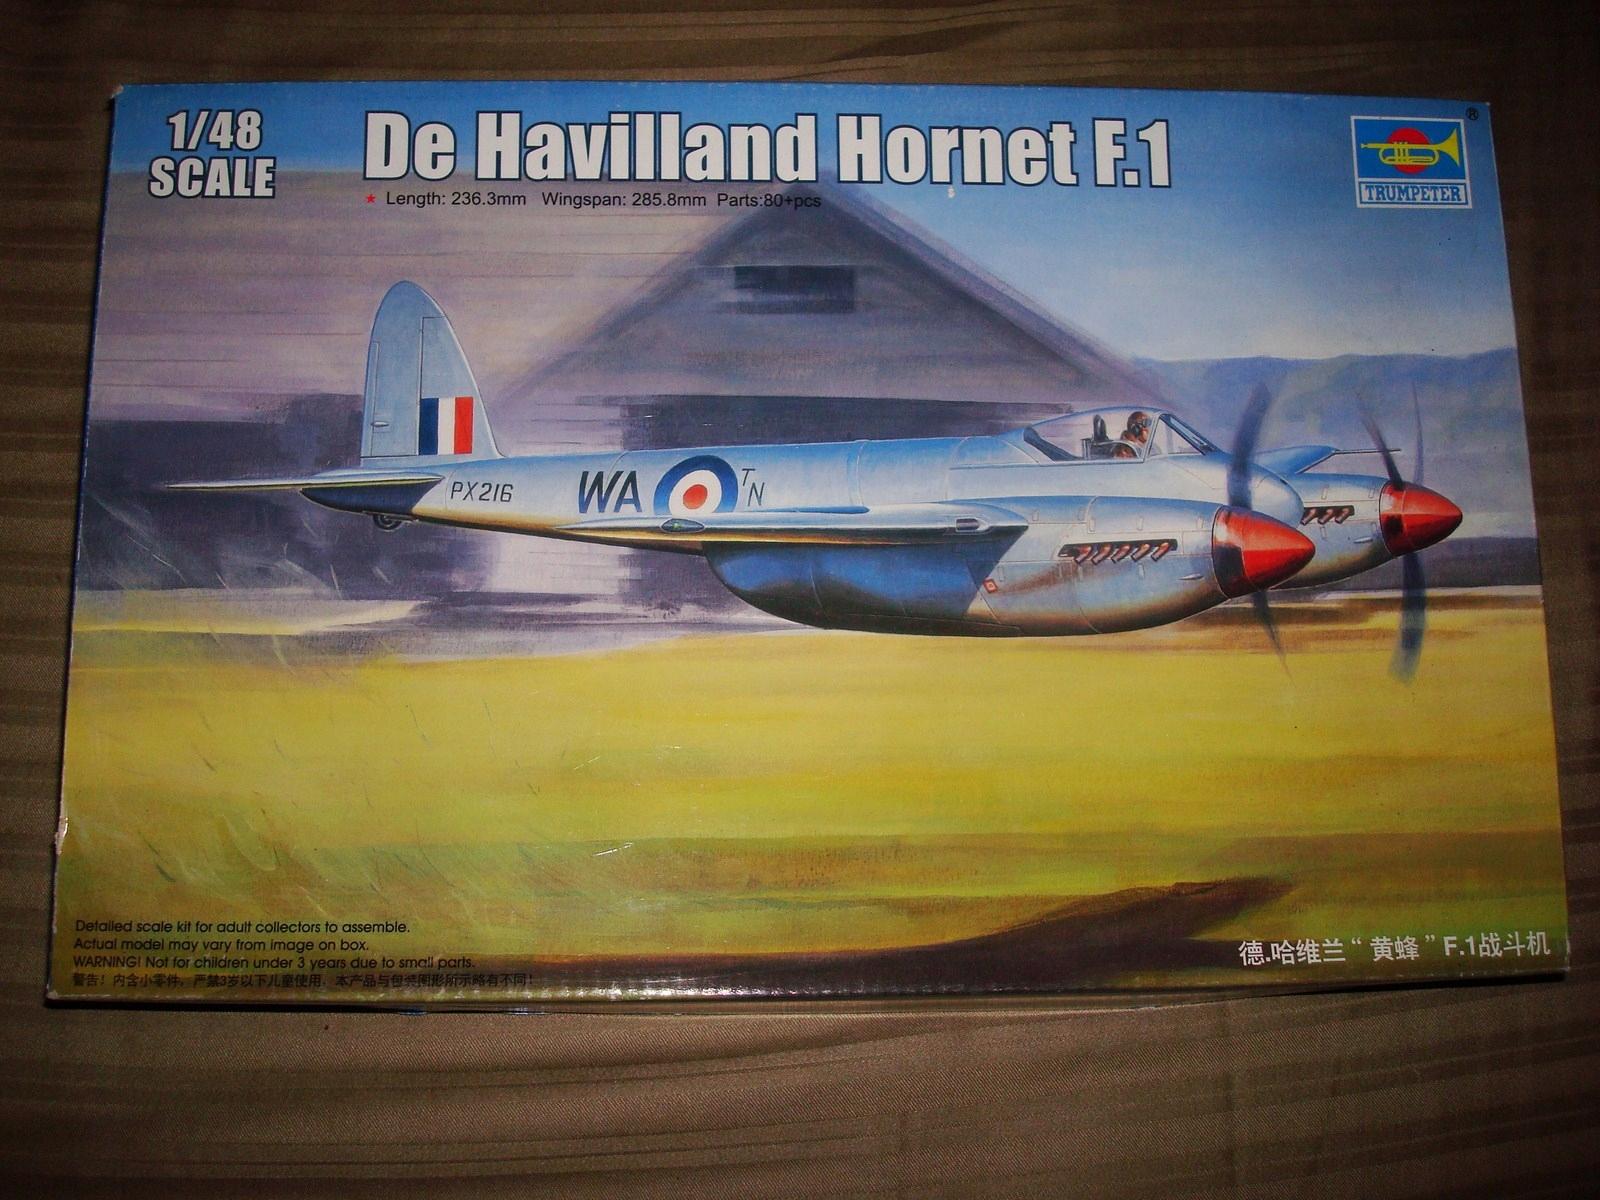 De Havilland Hornet F.1